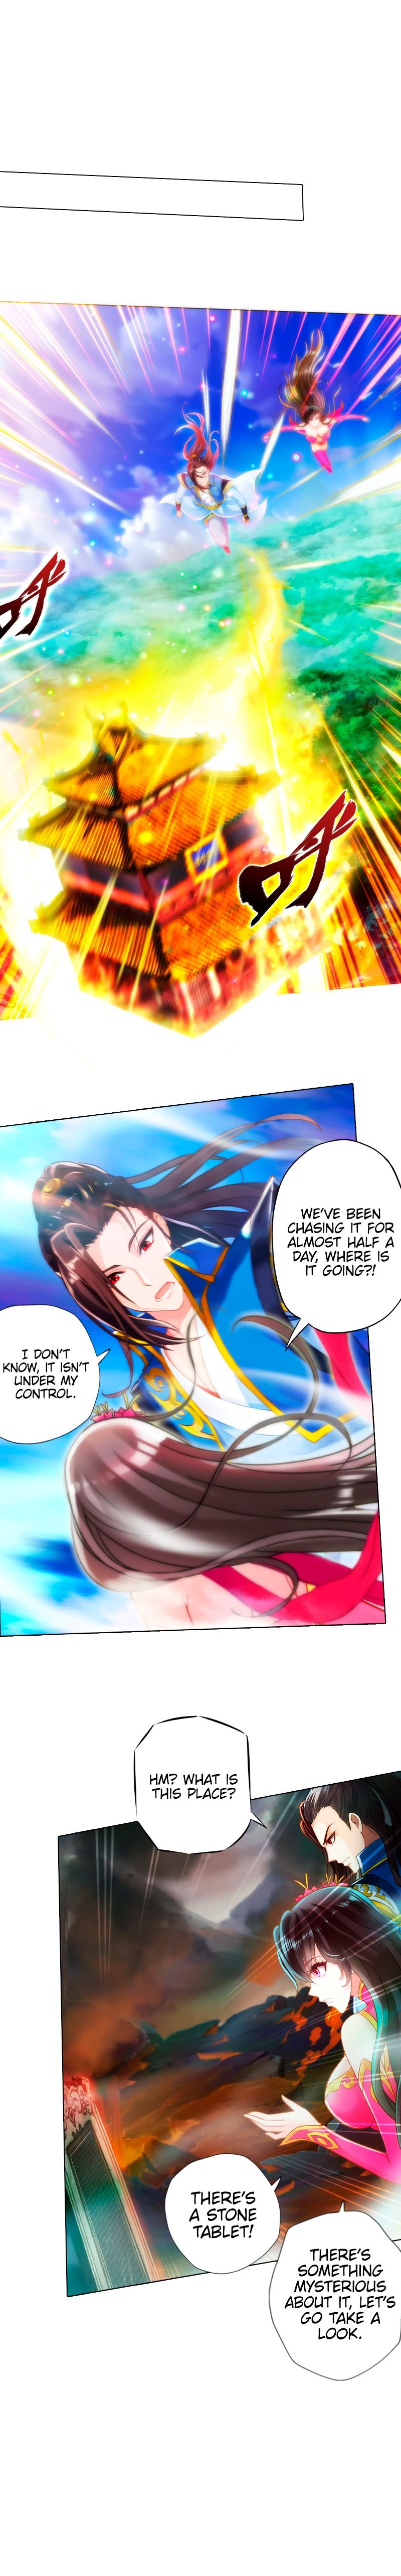 Manga Lang Huan Library - Chapter 80 Page 7